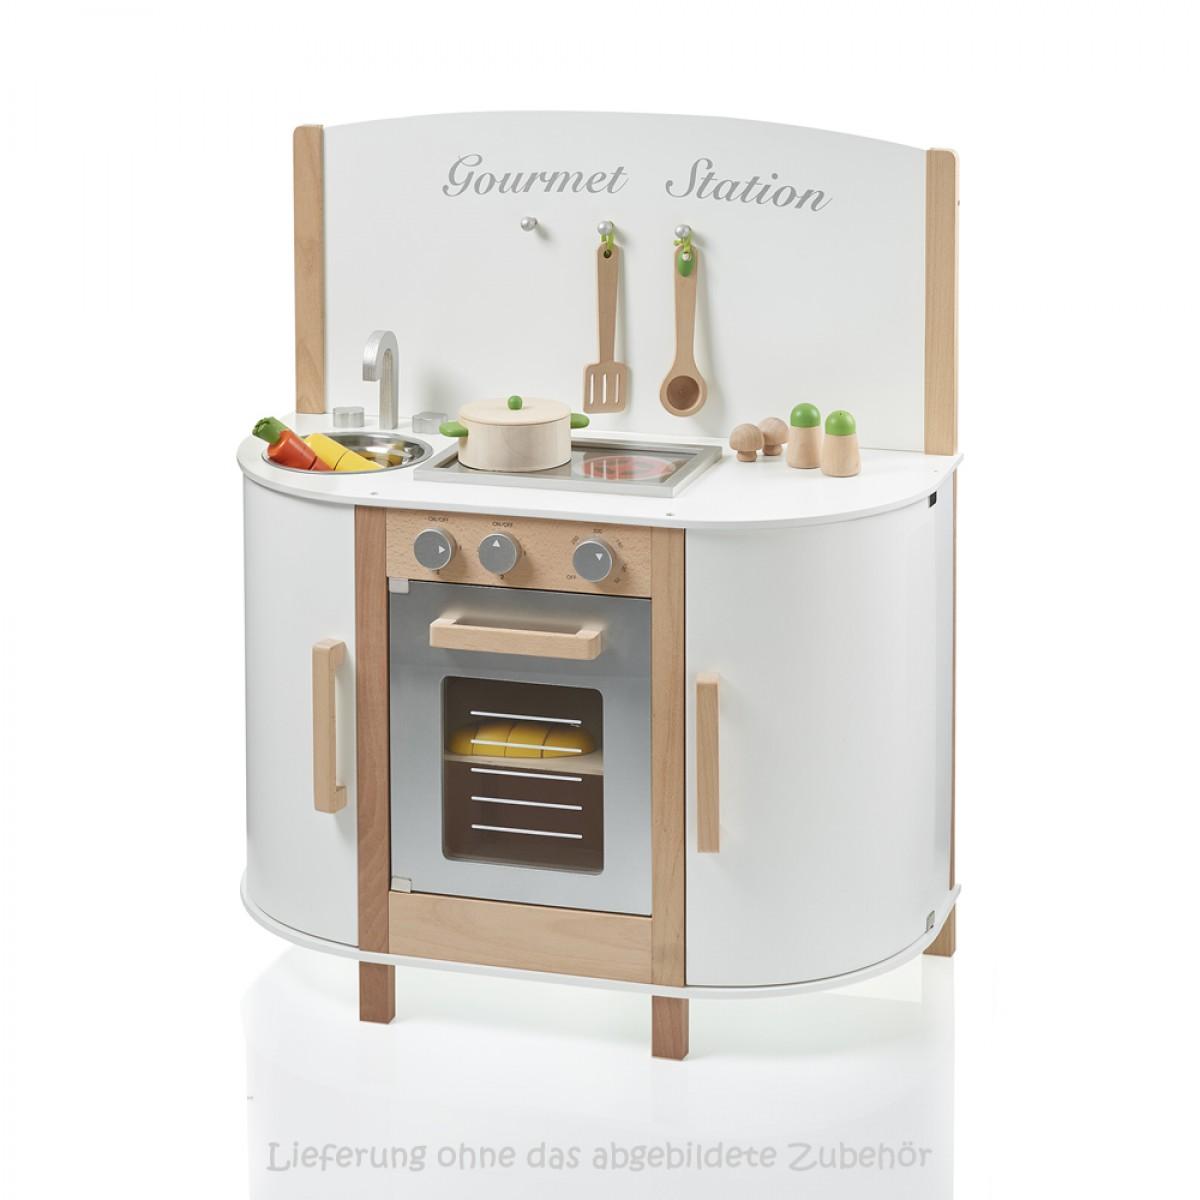 sun kinderk che gourmet station in wei holzspielzeug profi. Black Bedroom Furniture Sets. Home Design Ideas